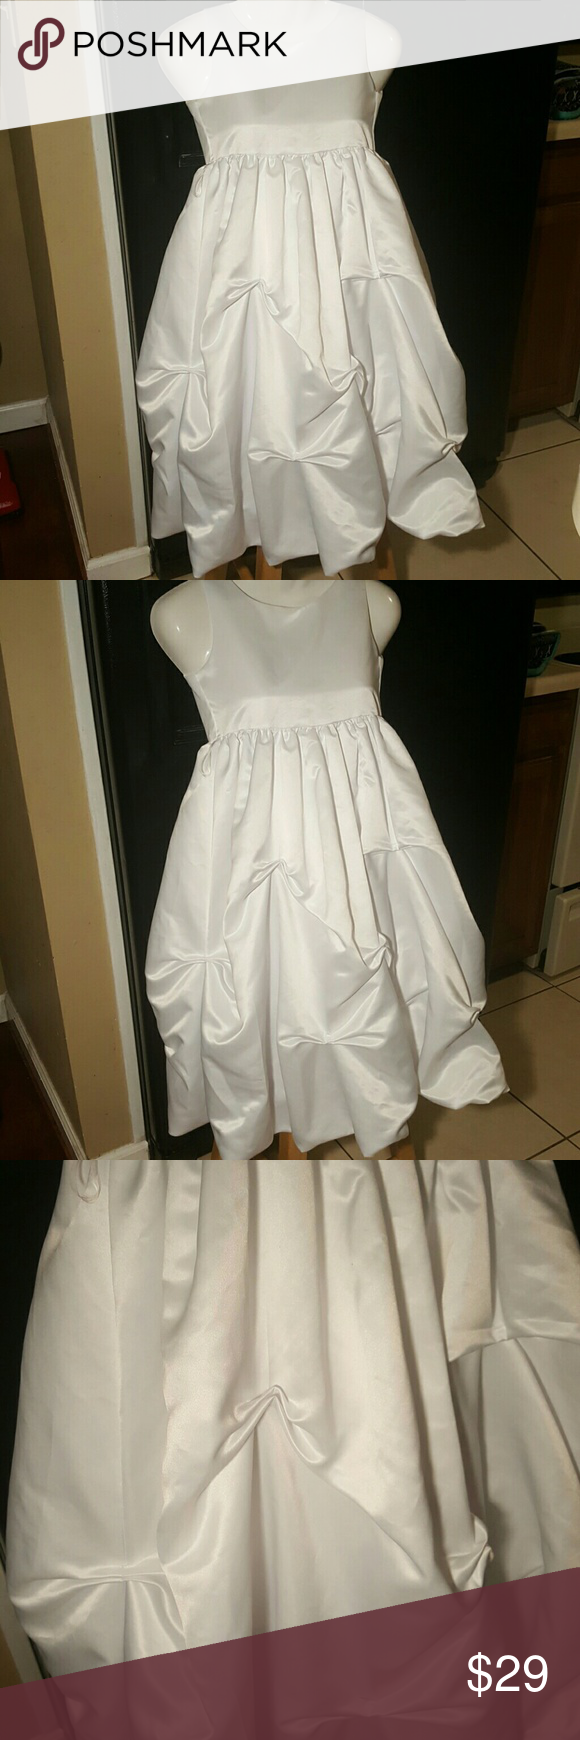 02f046635958 Girls Formal Dresses Size 8